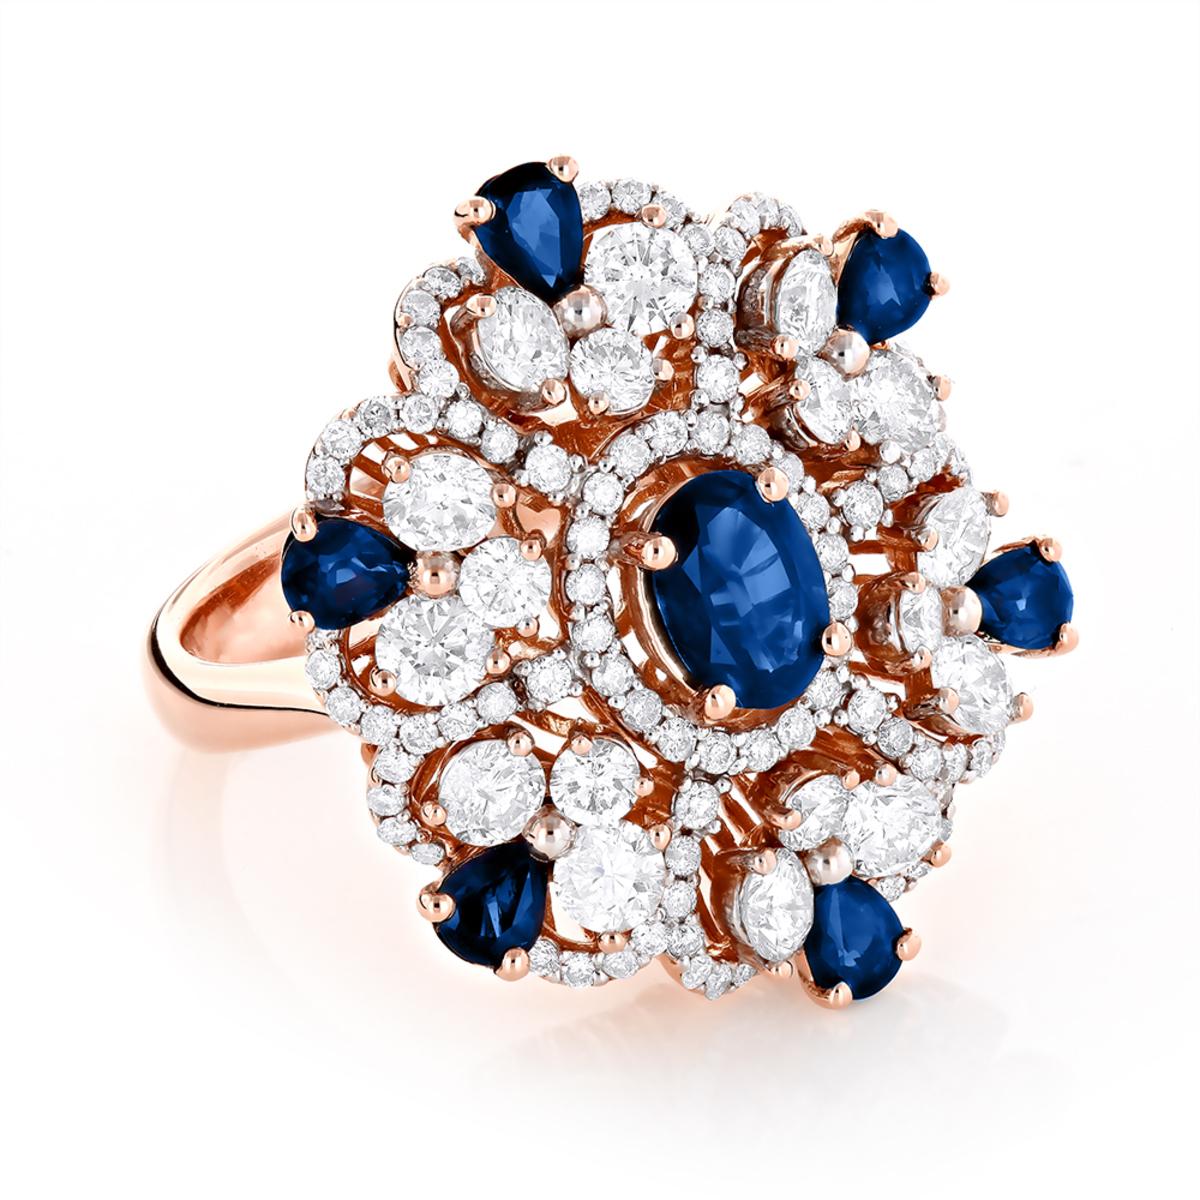 Designer Gemstone Jewelry: Unique Ladies Diamond and Sapphire Ring 18K Gold